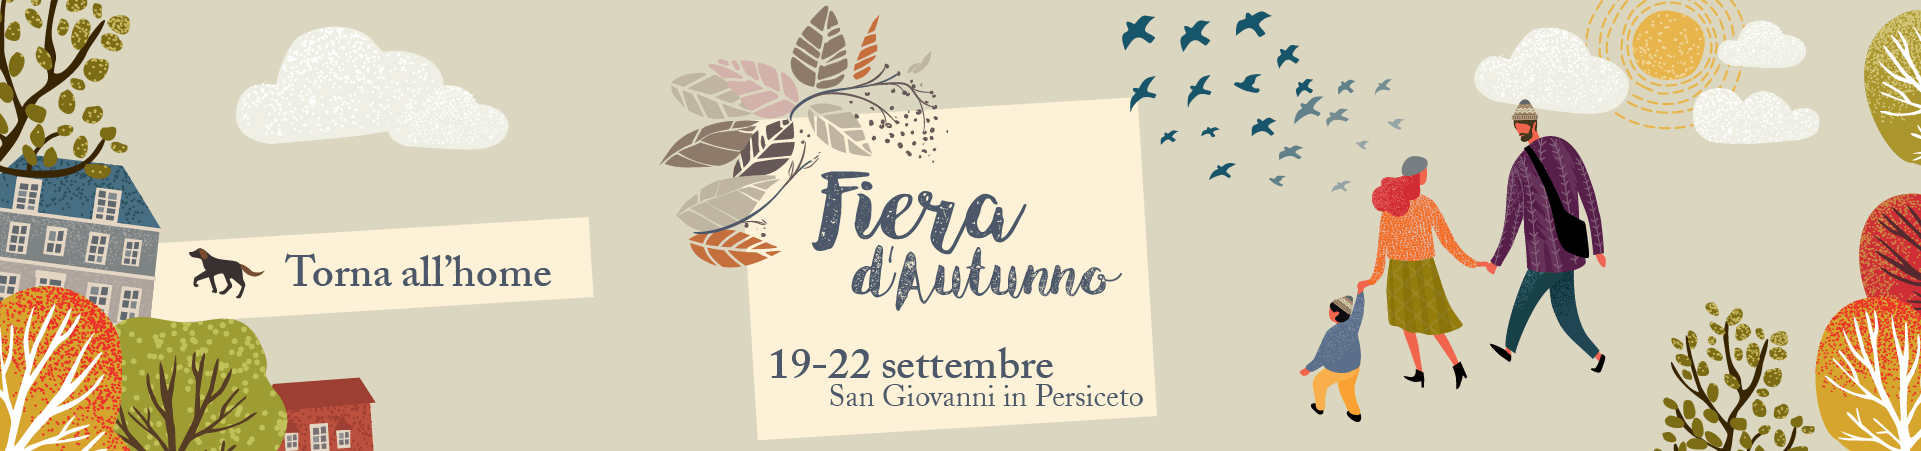 Simona Quaranta Calendario.Calendario Delphi Eventi